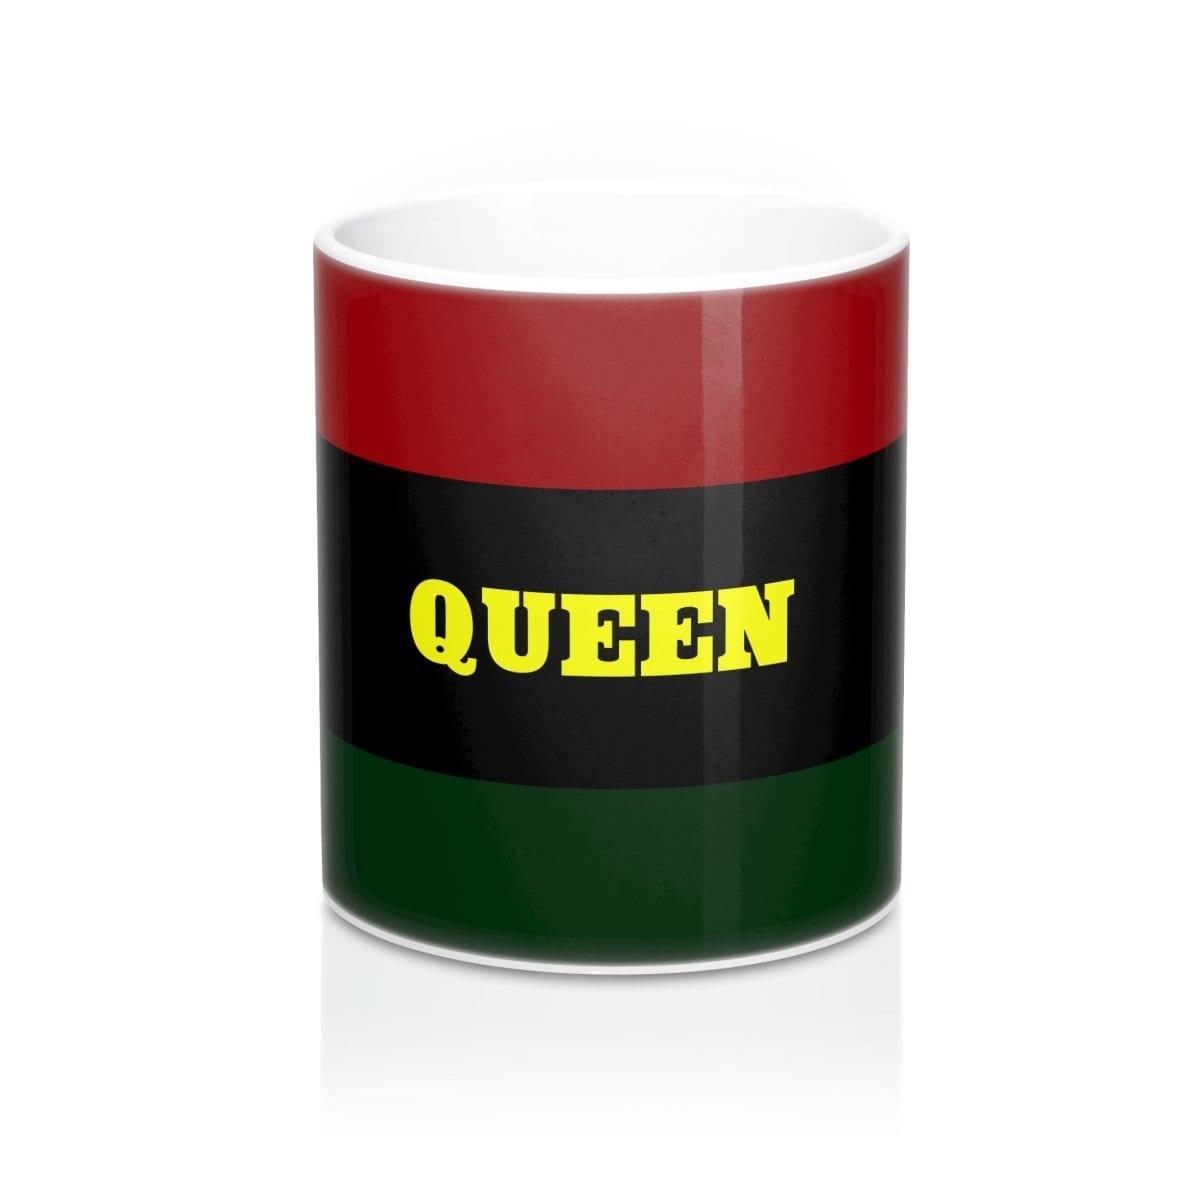 Queen RBG Mug 11oz - Melanin Apparel